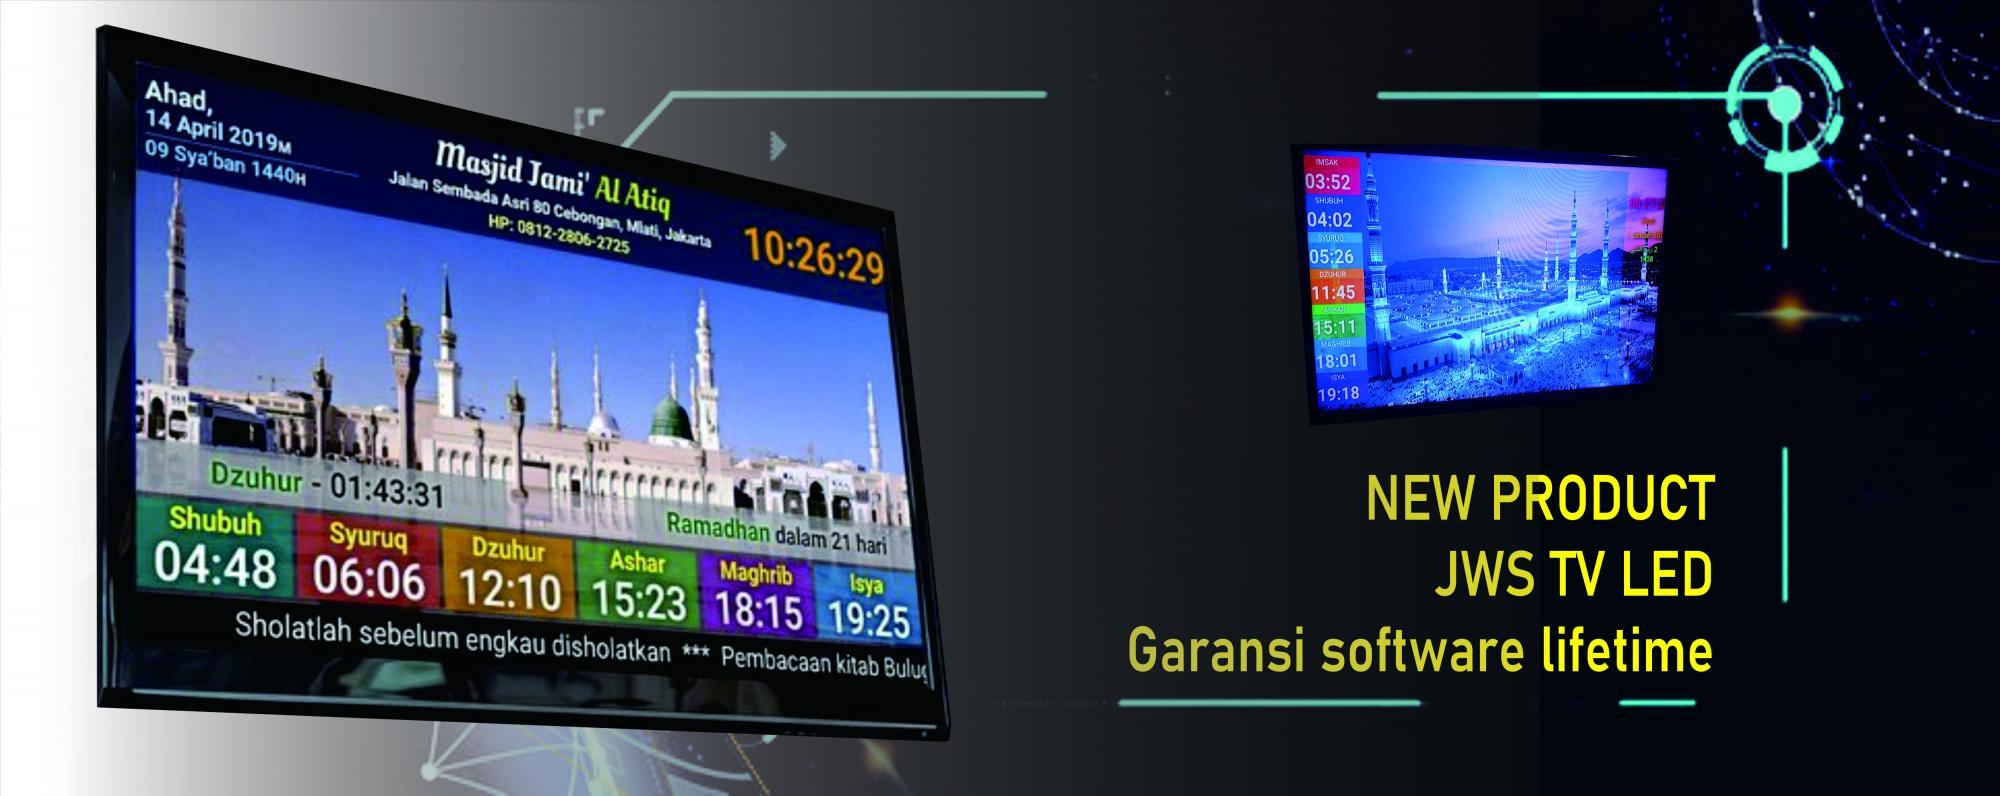 JADWAL SHOLAT DIGITAL TV LED